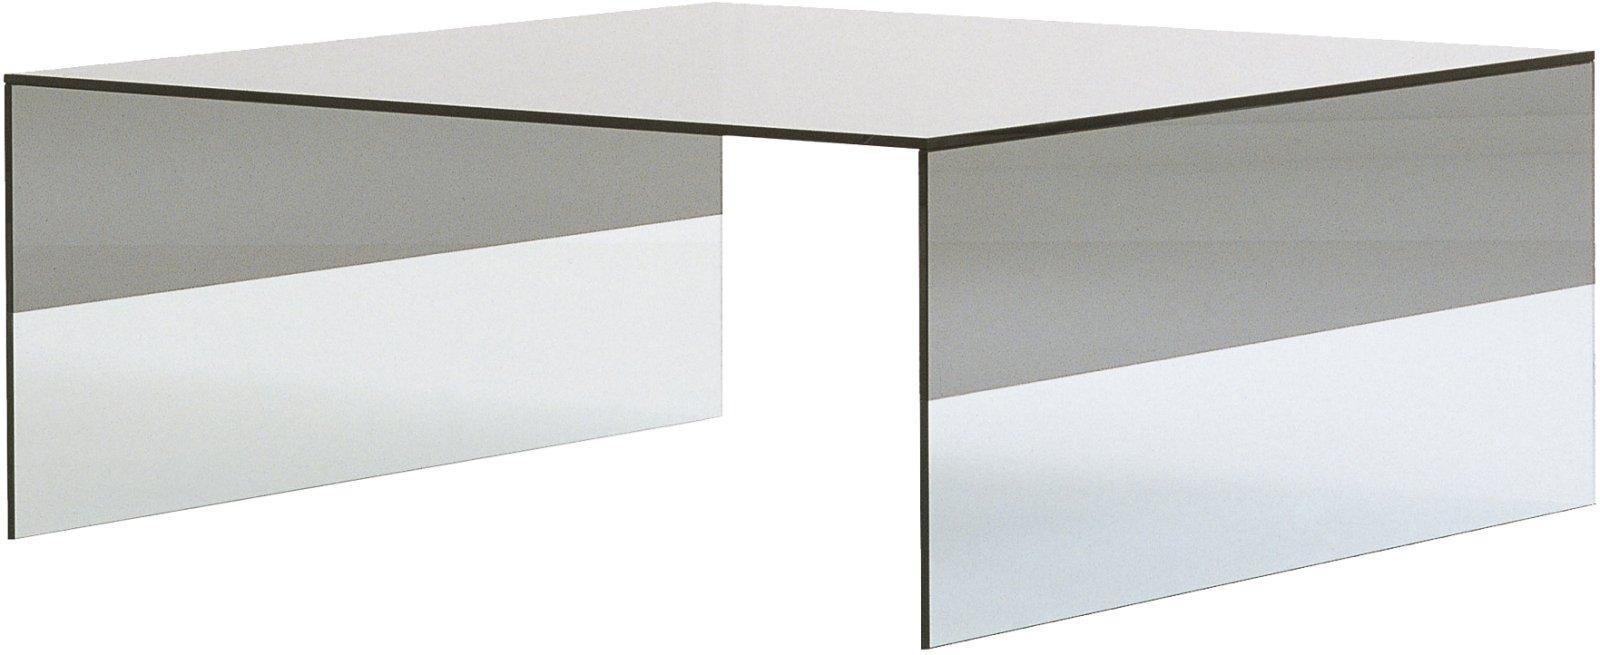 Smoke Service Table-new 100 x 100 x 44cm